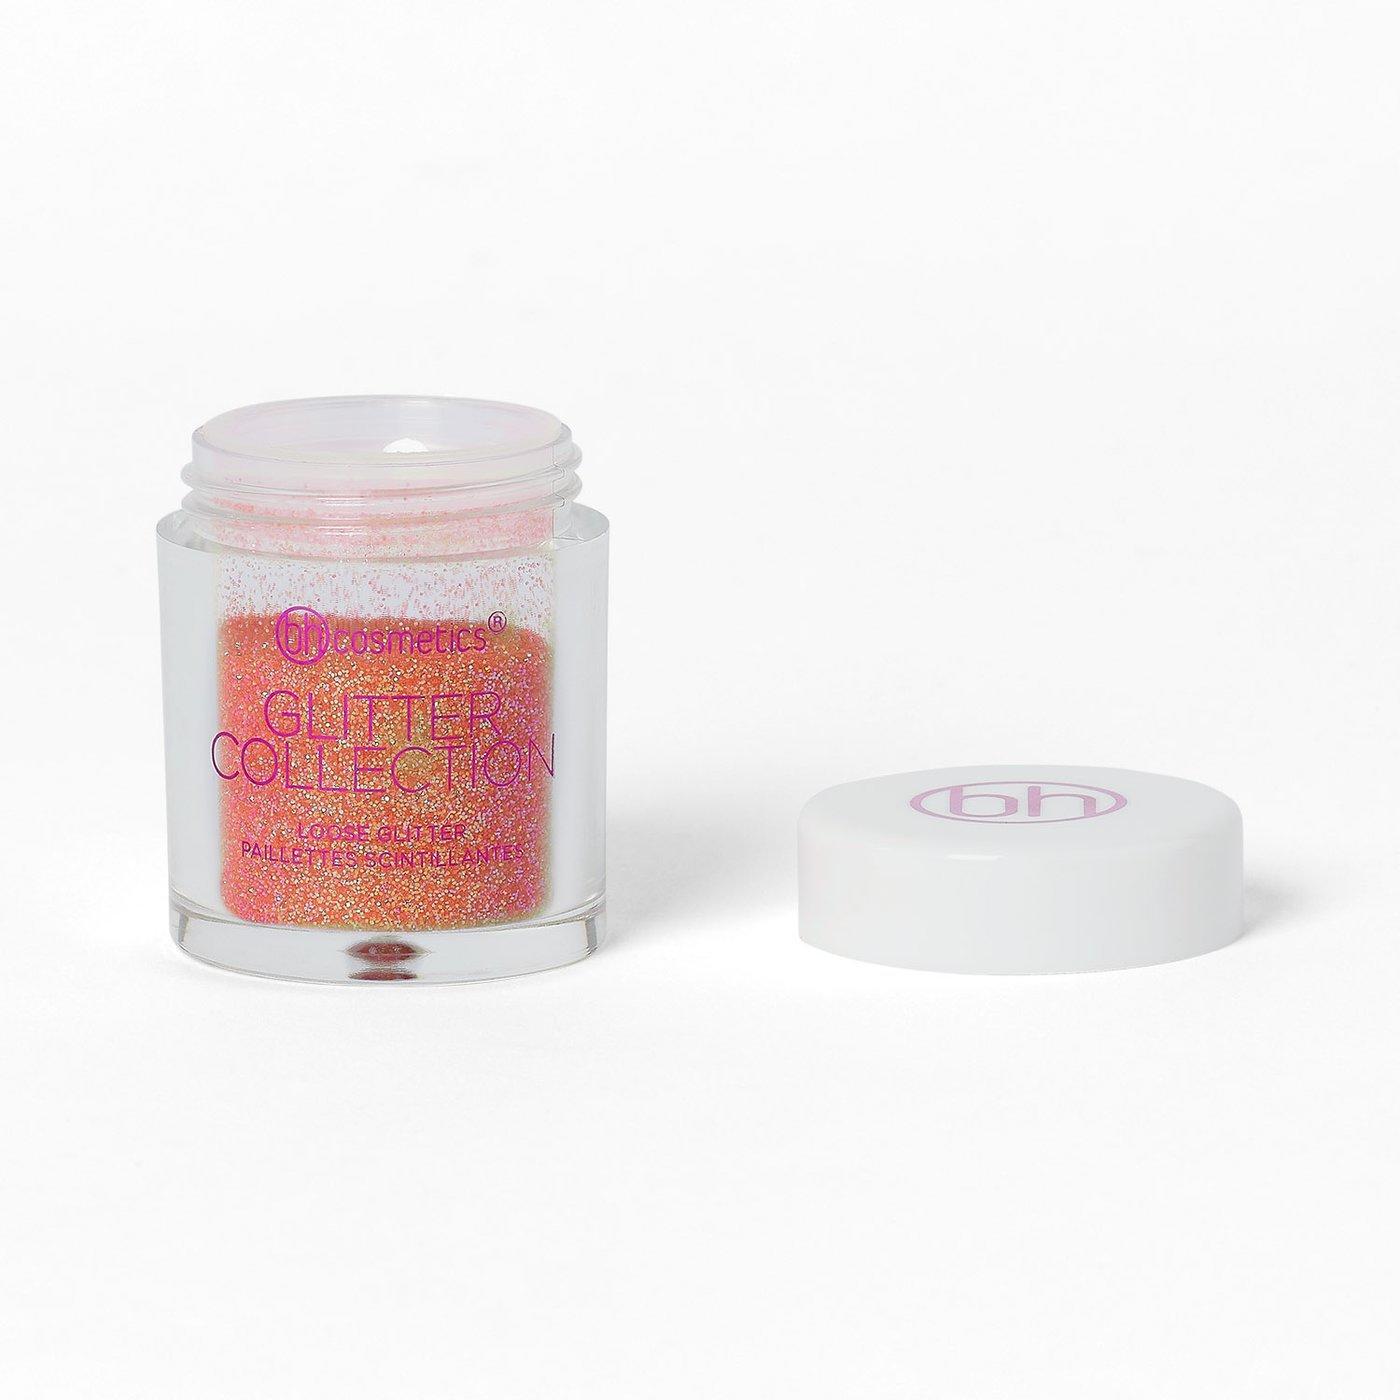 BH Cosmetics Loose Glitter Samba